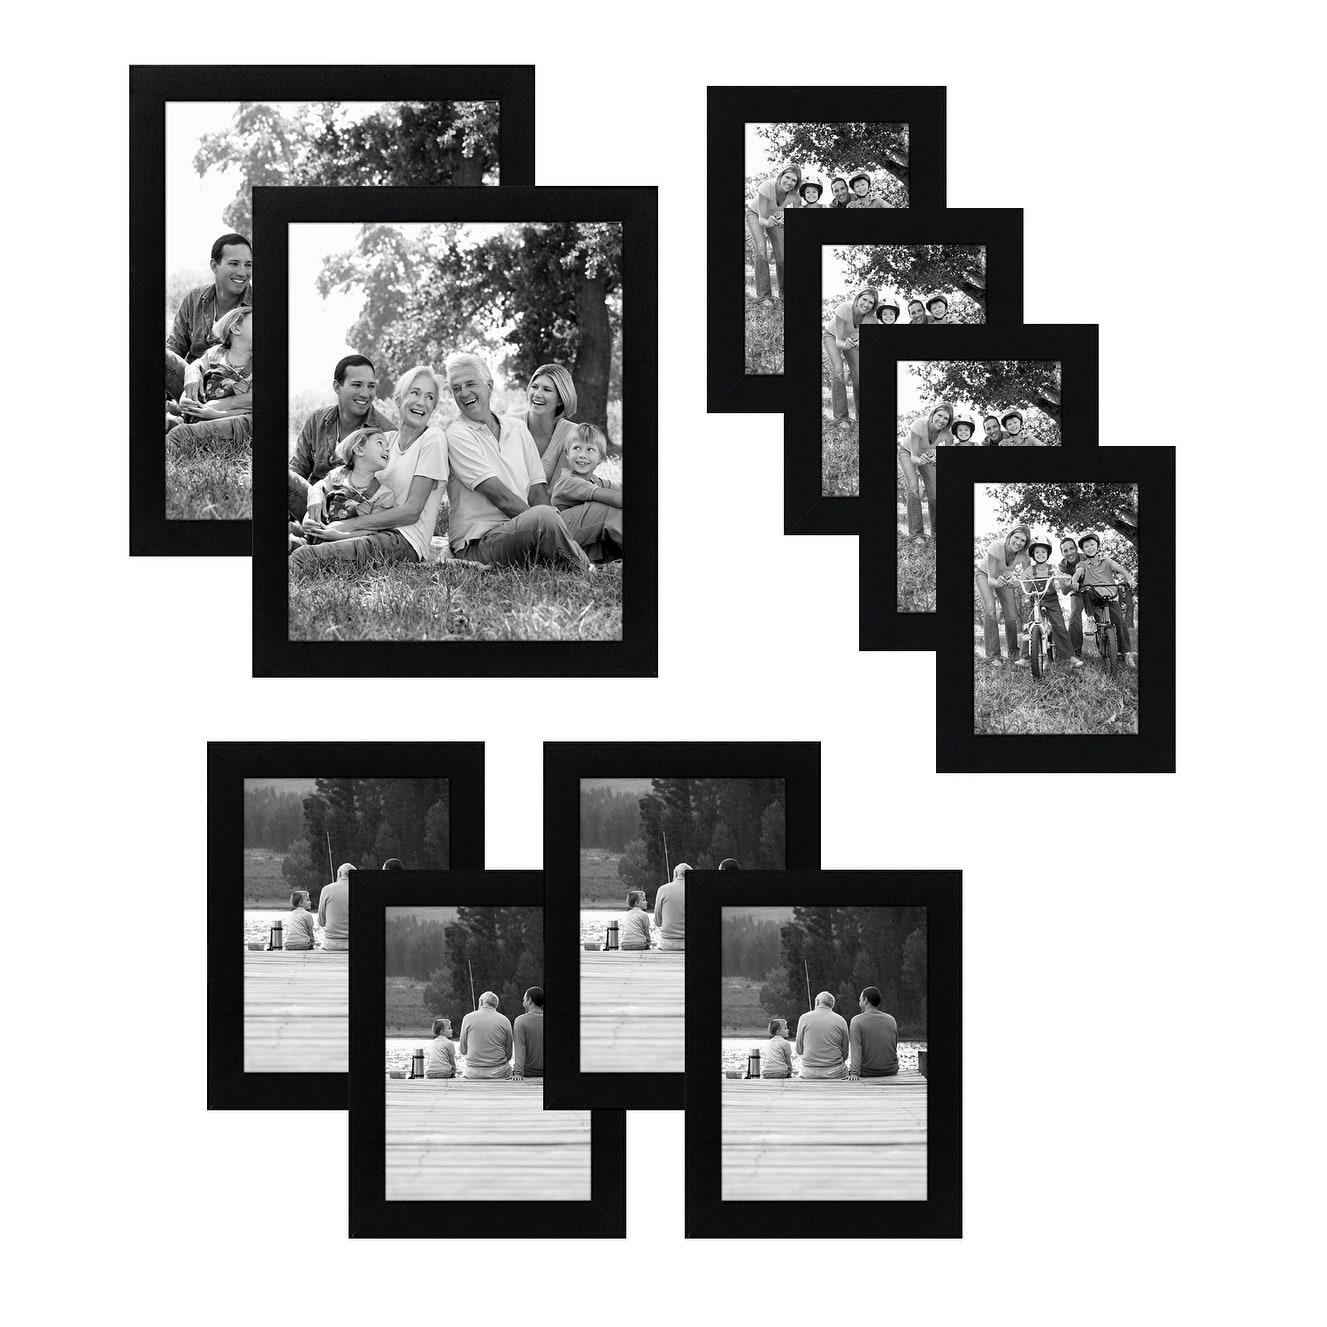 Americanflat 10 Piece Multipack Black Frames Includes Two 8x10 Frames Four 5x7 Frames And Four 4x6 Frames Overstock 22416519